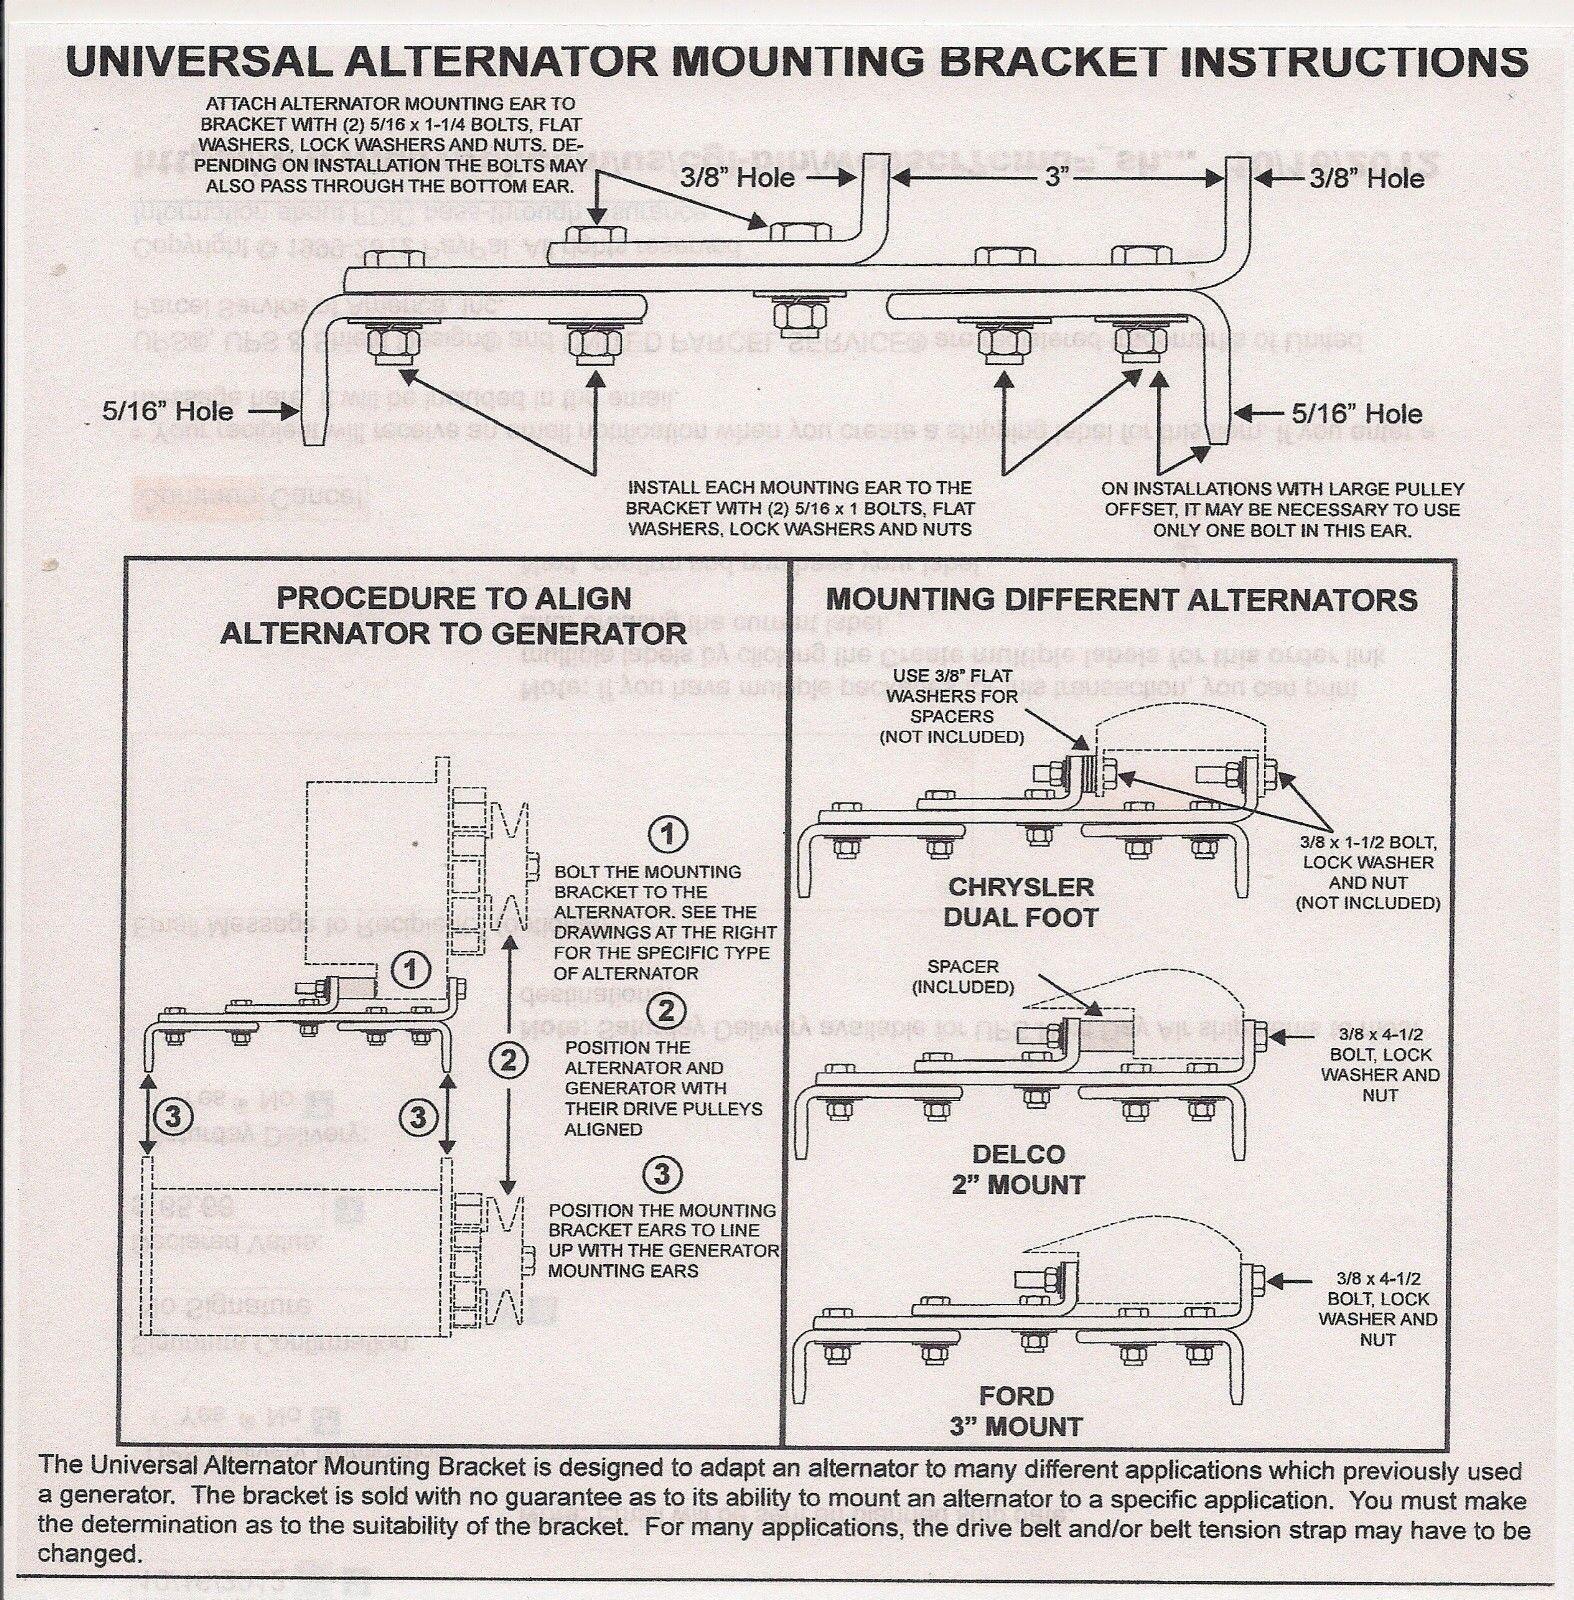 Universal Generator To Alternator Bracket S 1508 Gdr 910 A 200 Ebay Alternators Parts Diagram Mounting